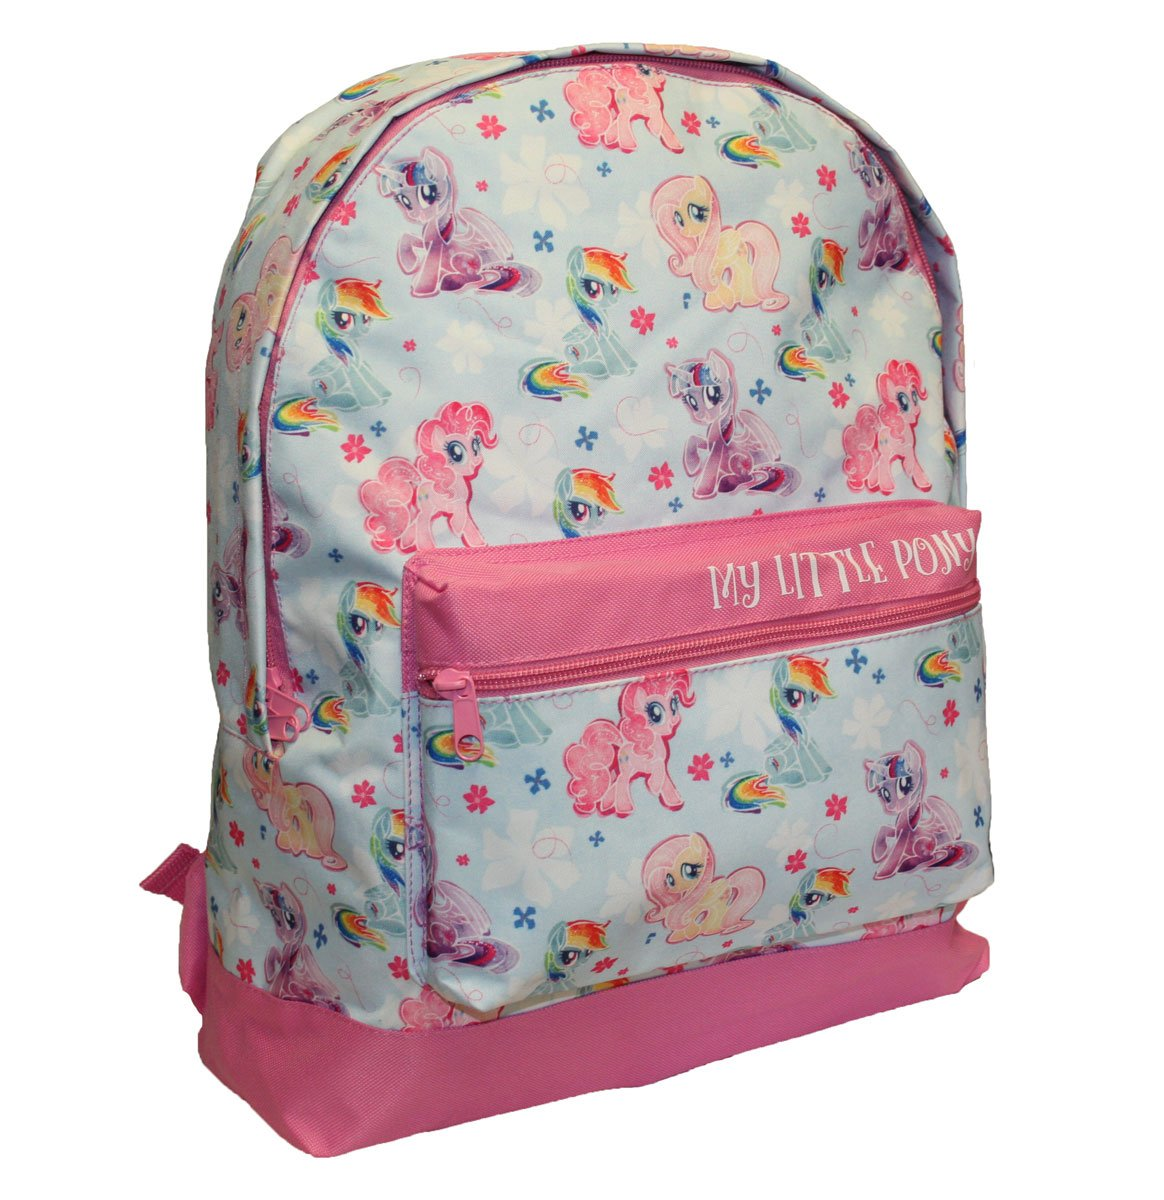 My Little Pony Roxy Children's Backpack, 40 cm, 16 L, Multicolour   B073XV2SDH